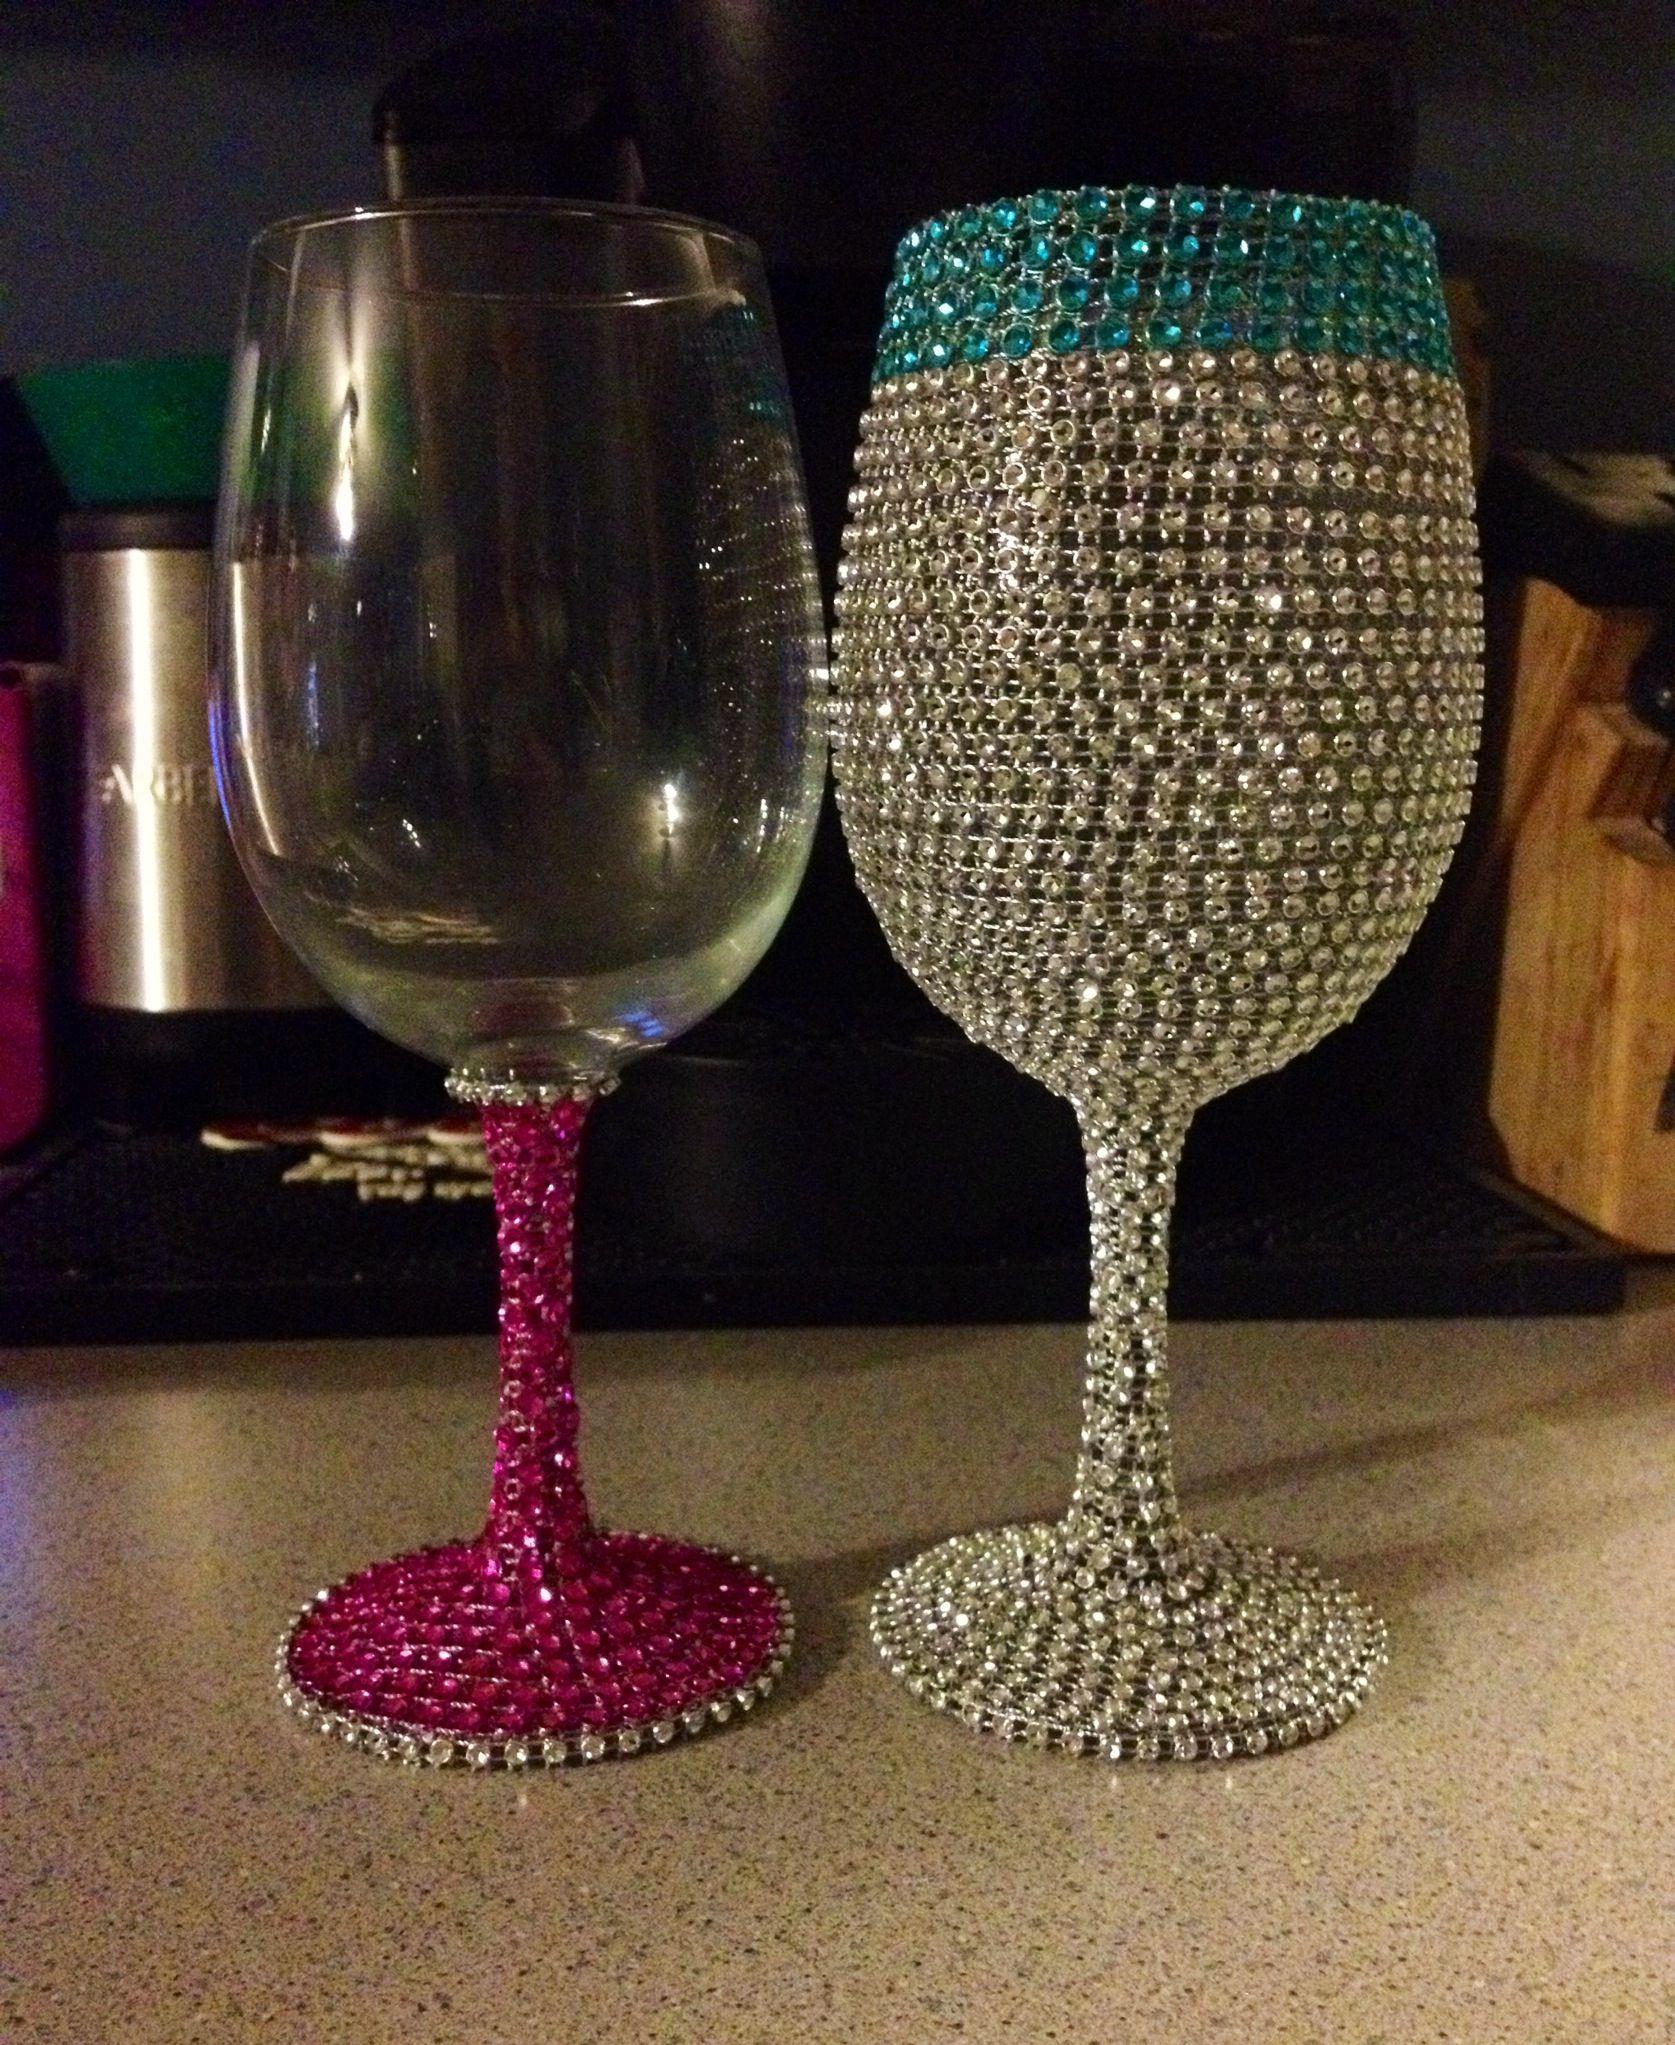 Bling Wine Glasses Diy Wine Glass Diy Wine Glasses Decorated Wine Glasses